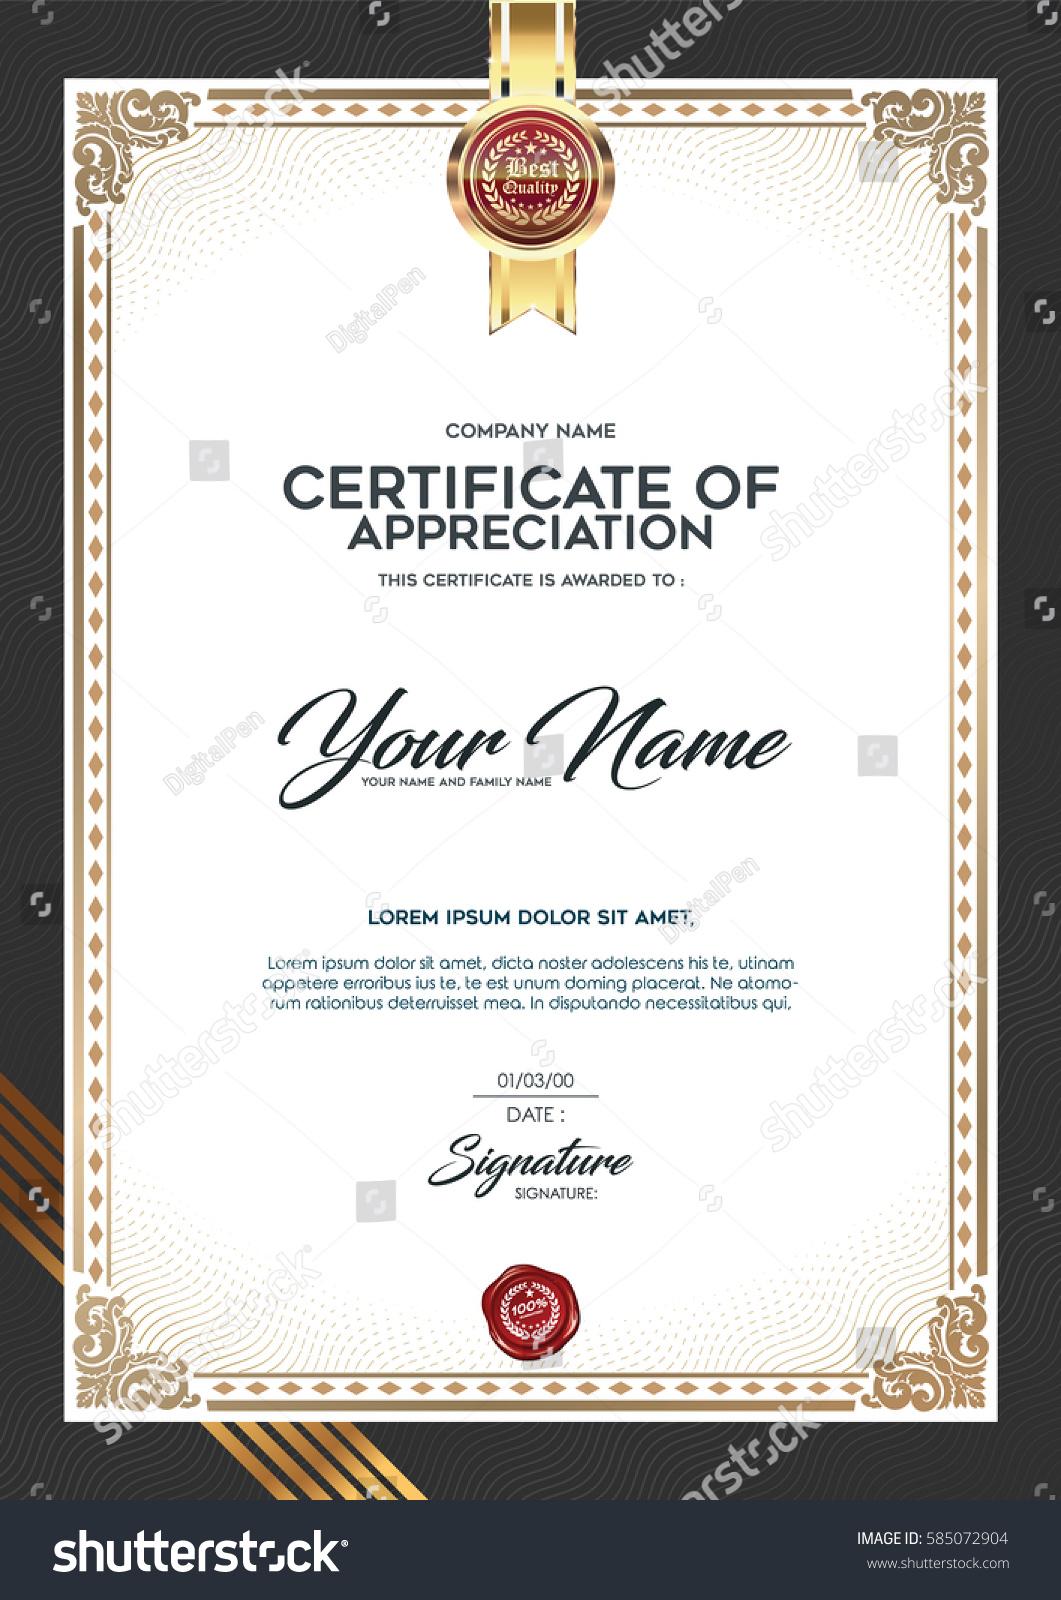 layout text format certification premium certificate stock vector